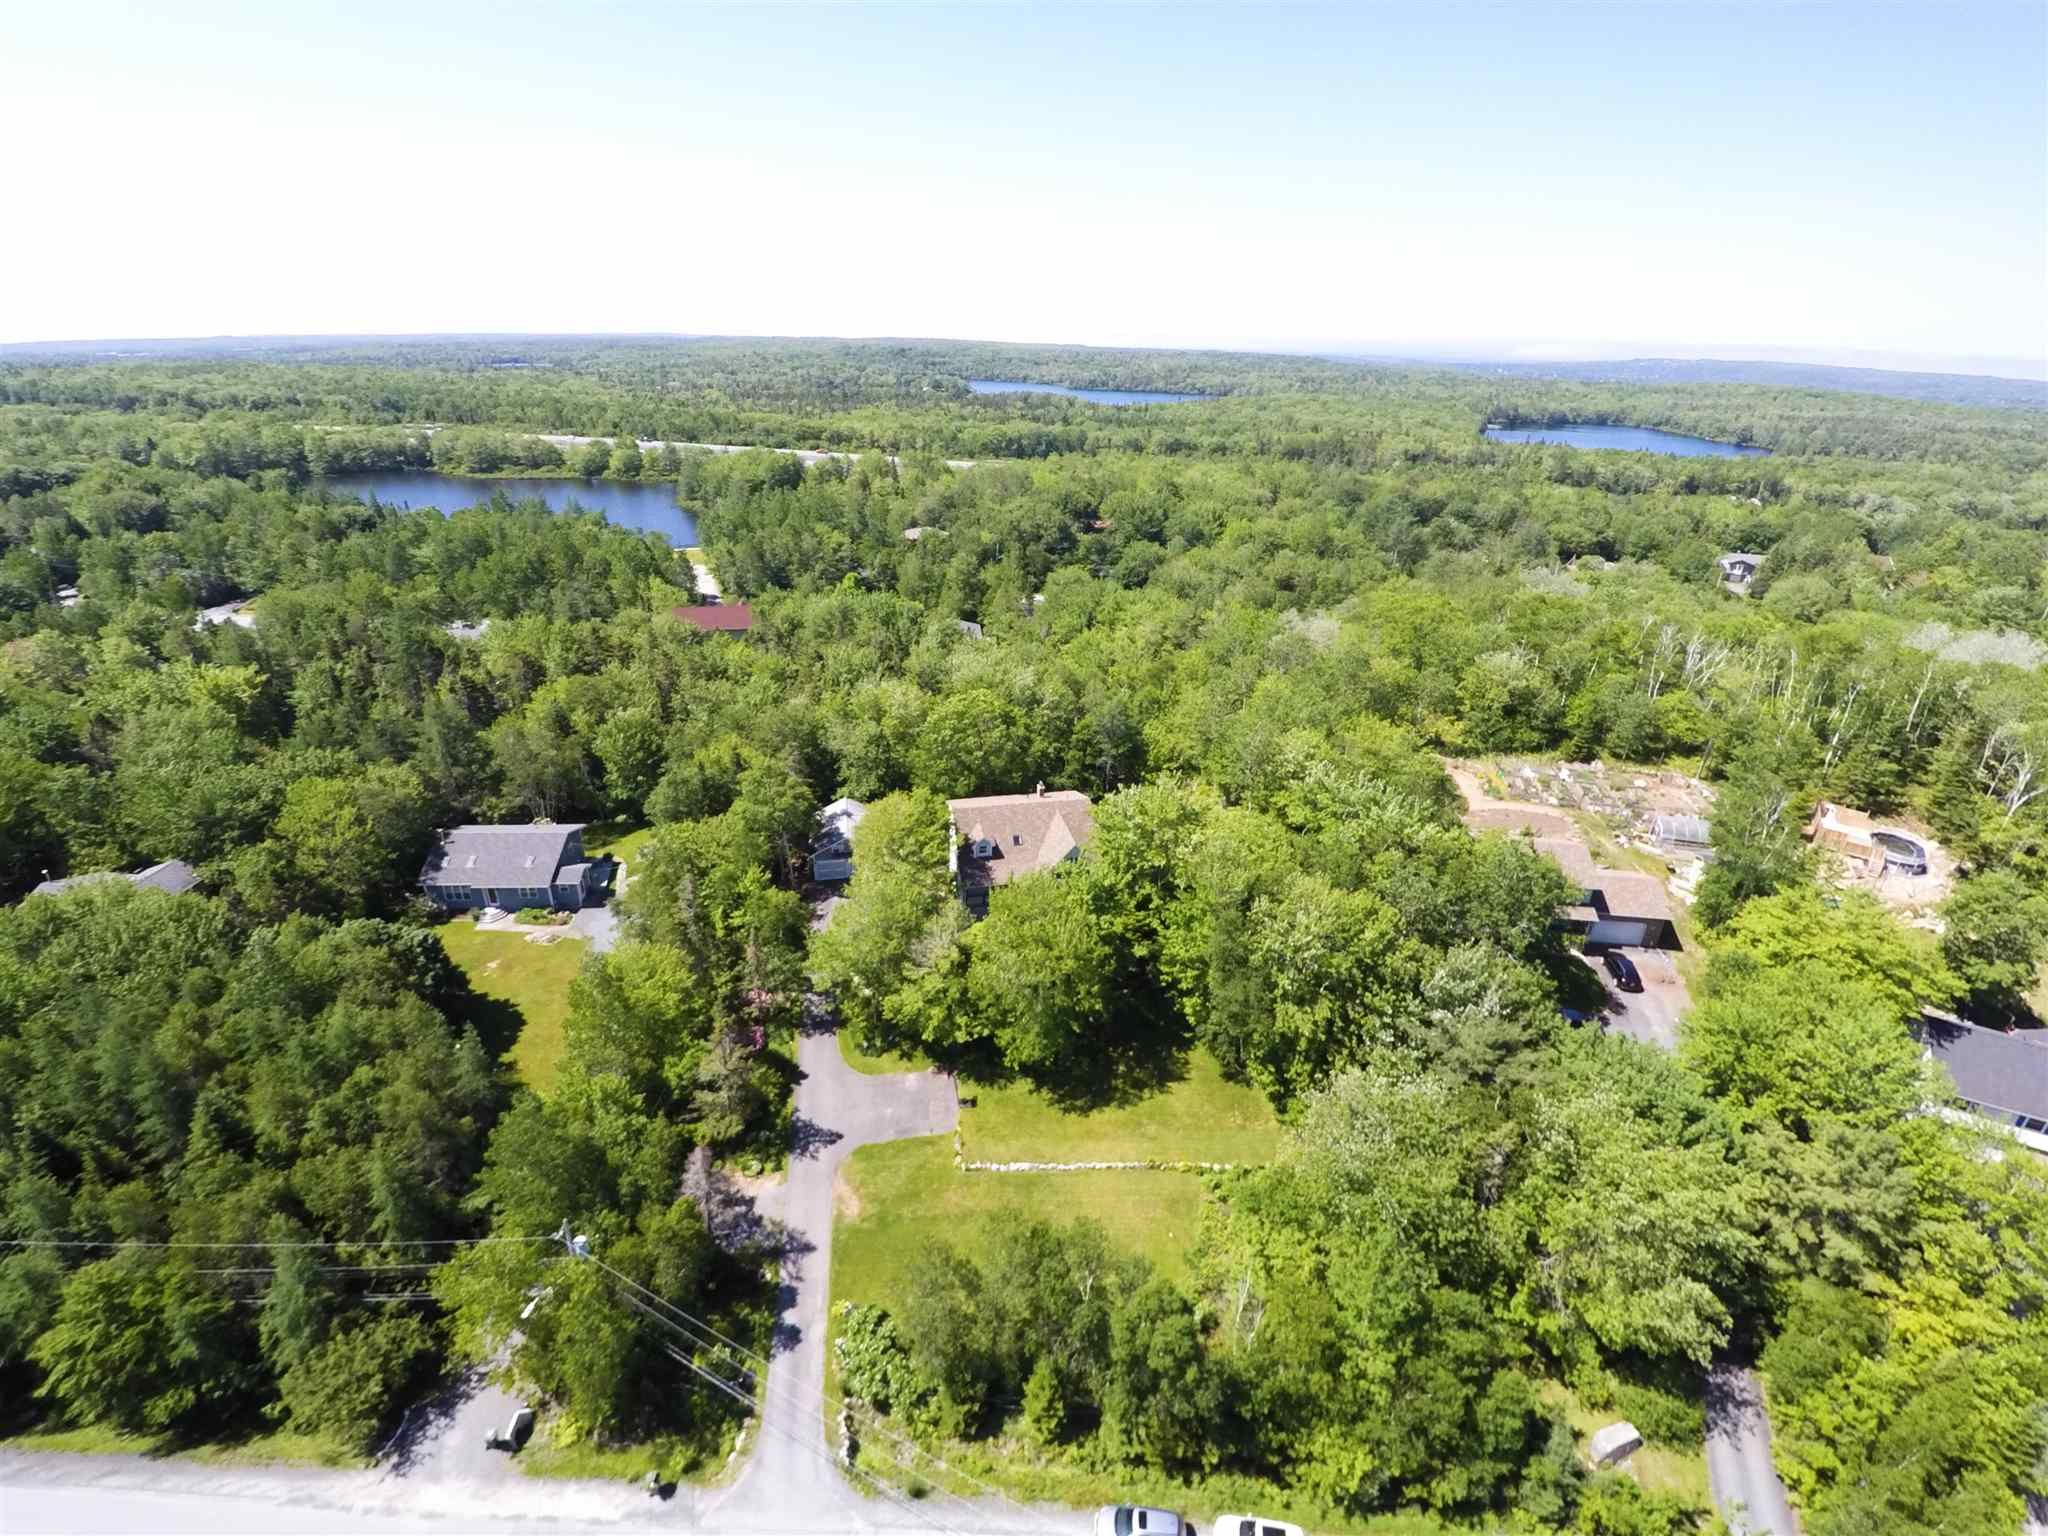 Main Photo: 305 Windsor Drive in Stillwater Lake: 21-Kingswood, Haliburton Hills, Hammonds Pl. Residential for sale (Halifax-Dartmouth)  : MLS®# 202115349